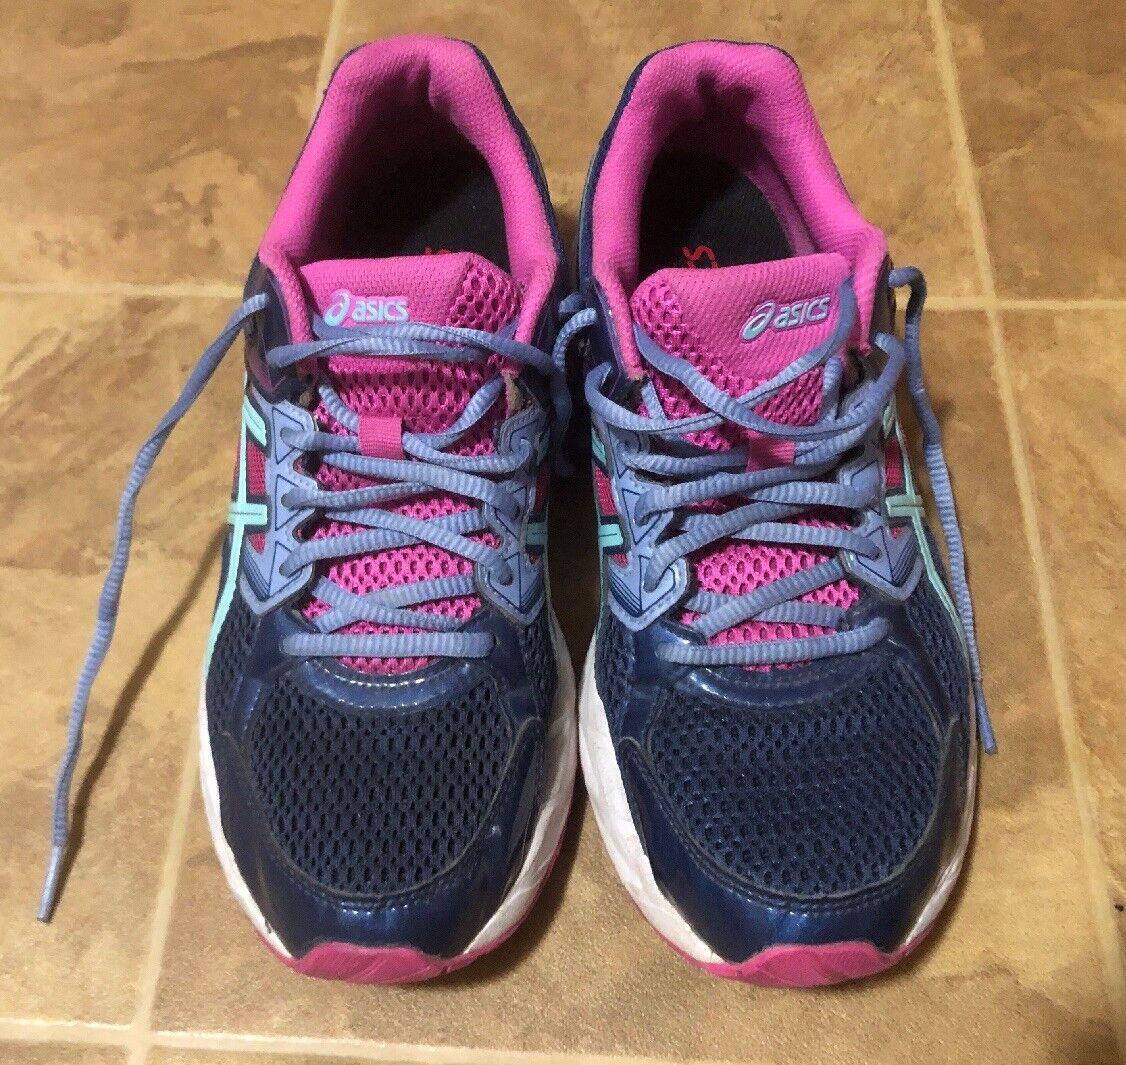 Asics Gel Contend 3 Athletic Indigo bluee Pink Aqua Running shoes Women's Size 9